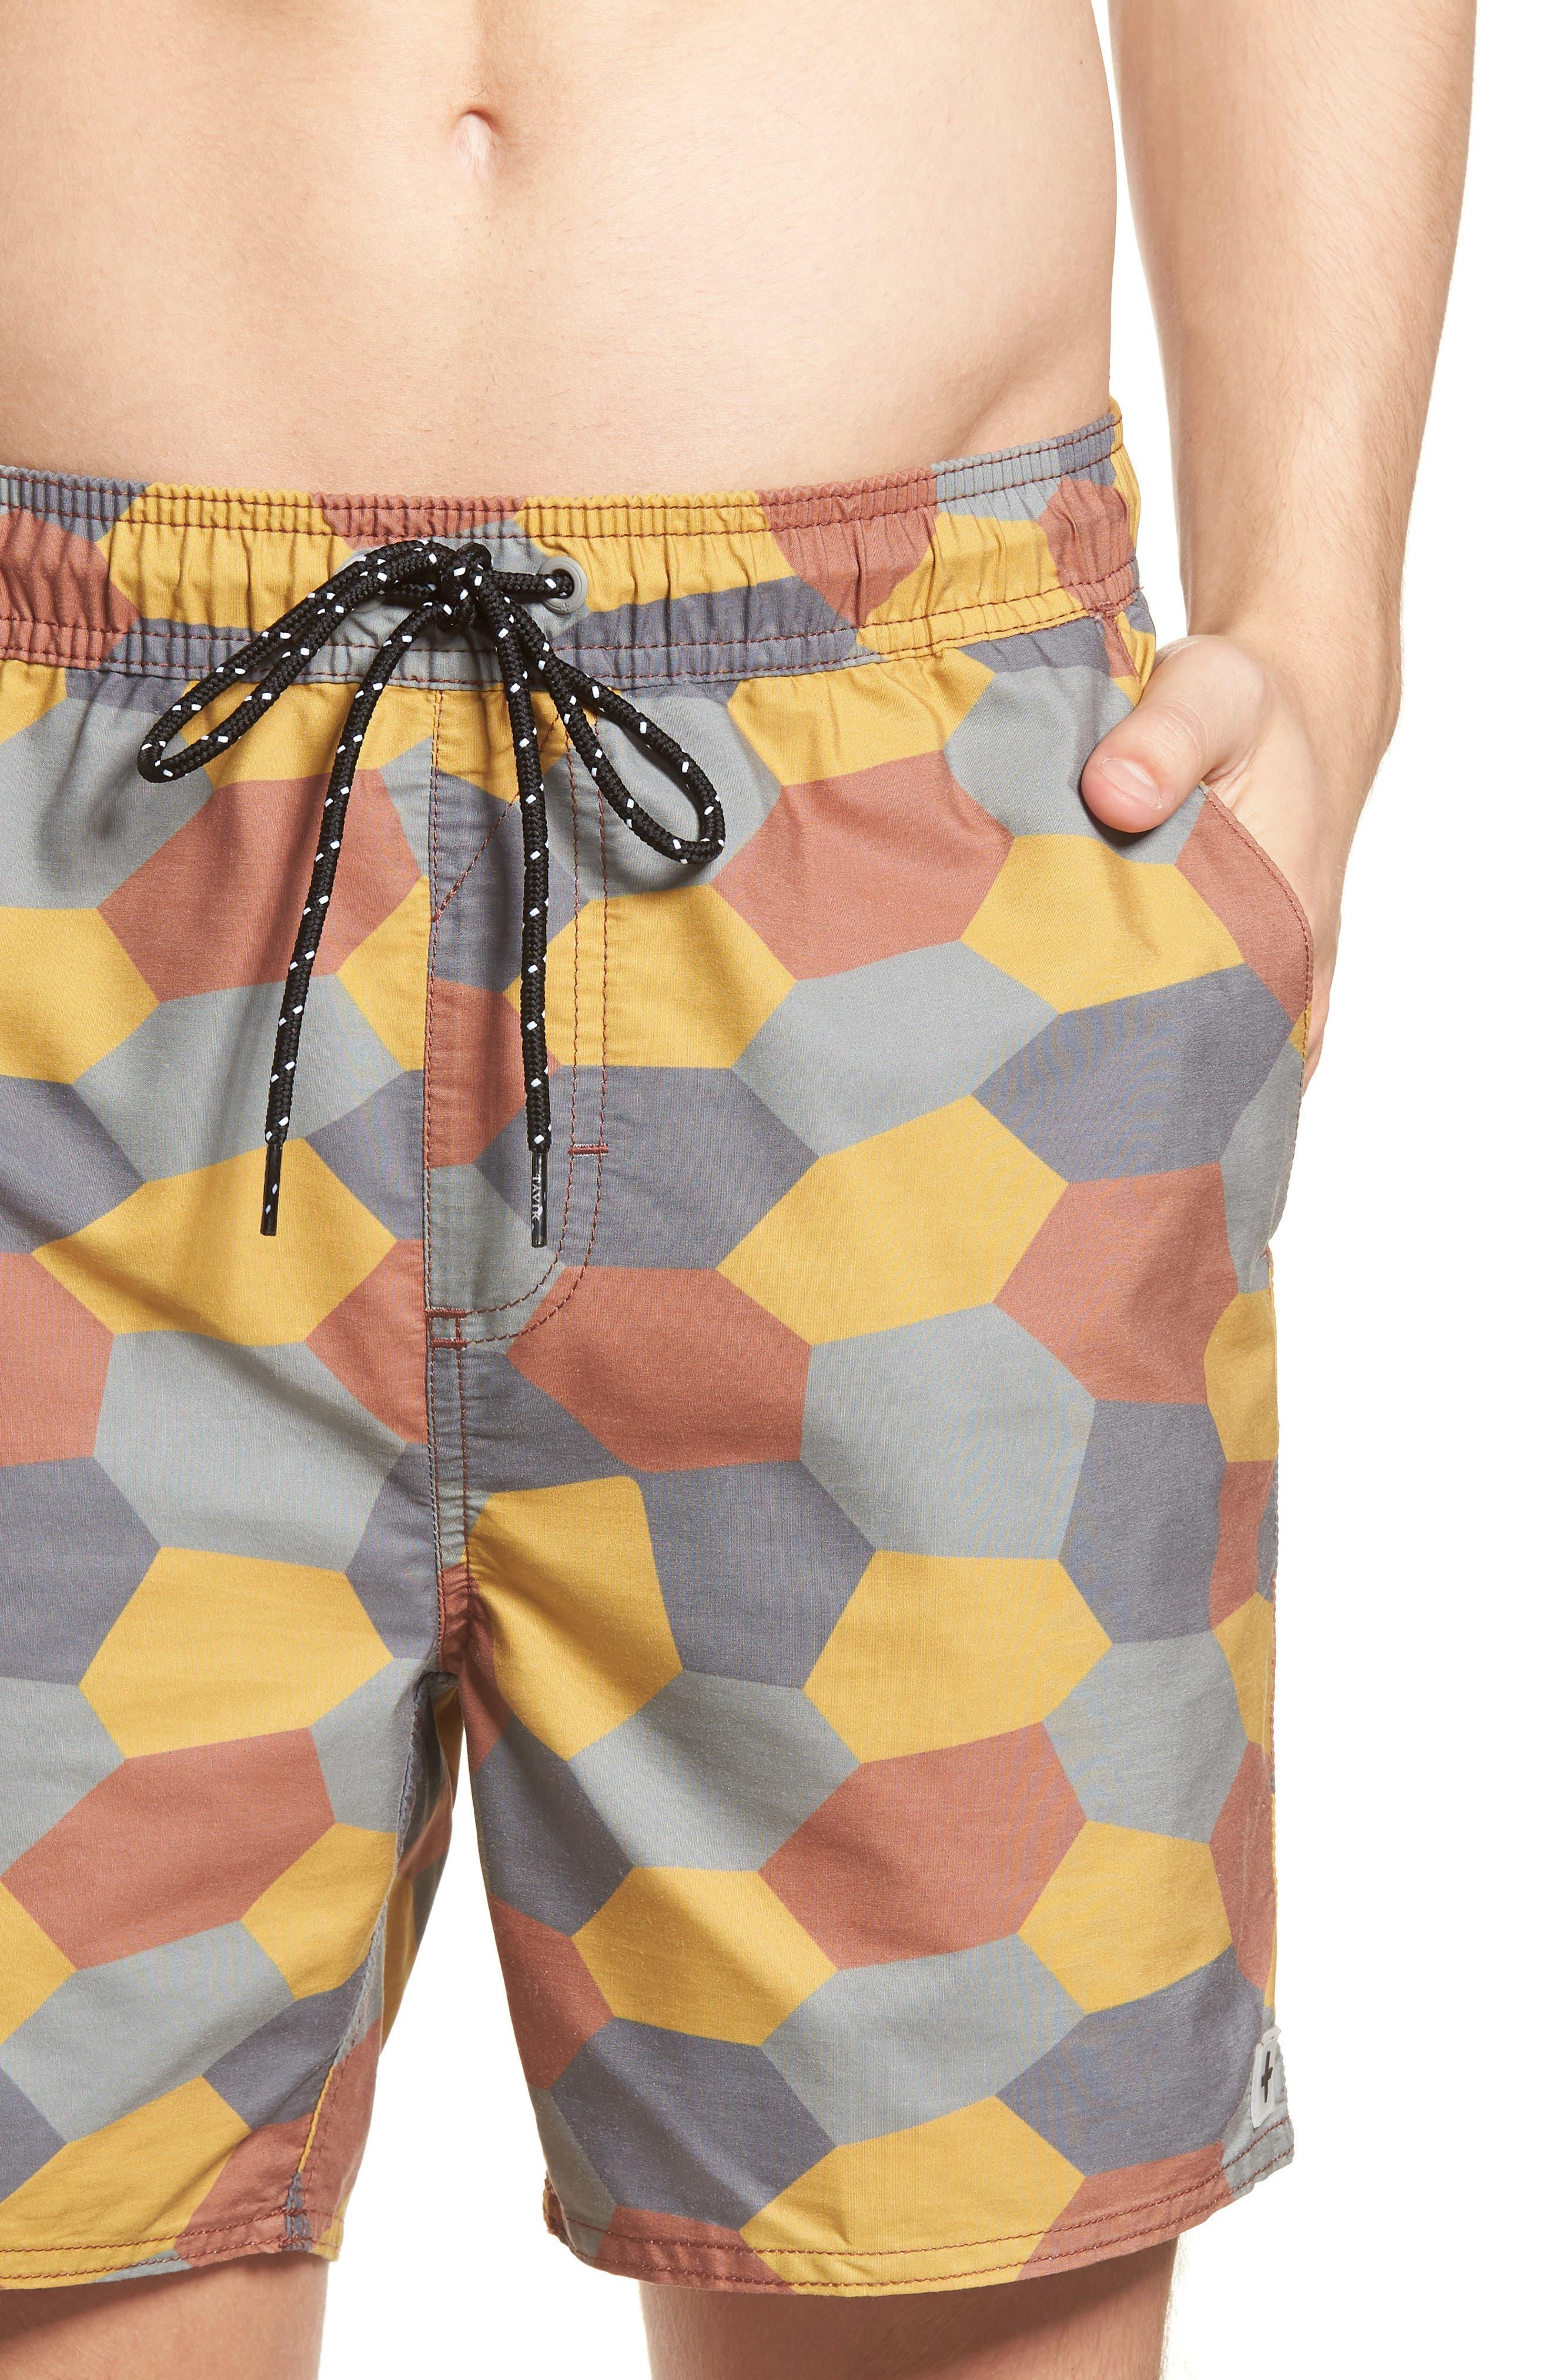 Belmont Pool Shorts,                             Alternate thumbnail 4, color,                             Coastal Orange Geo Camo